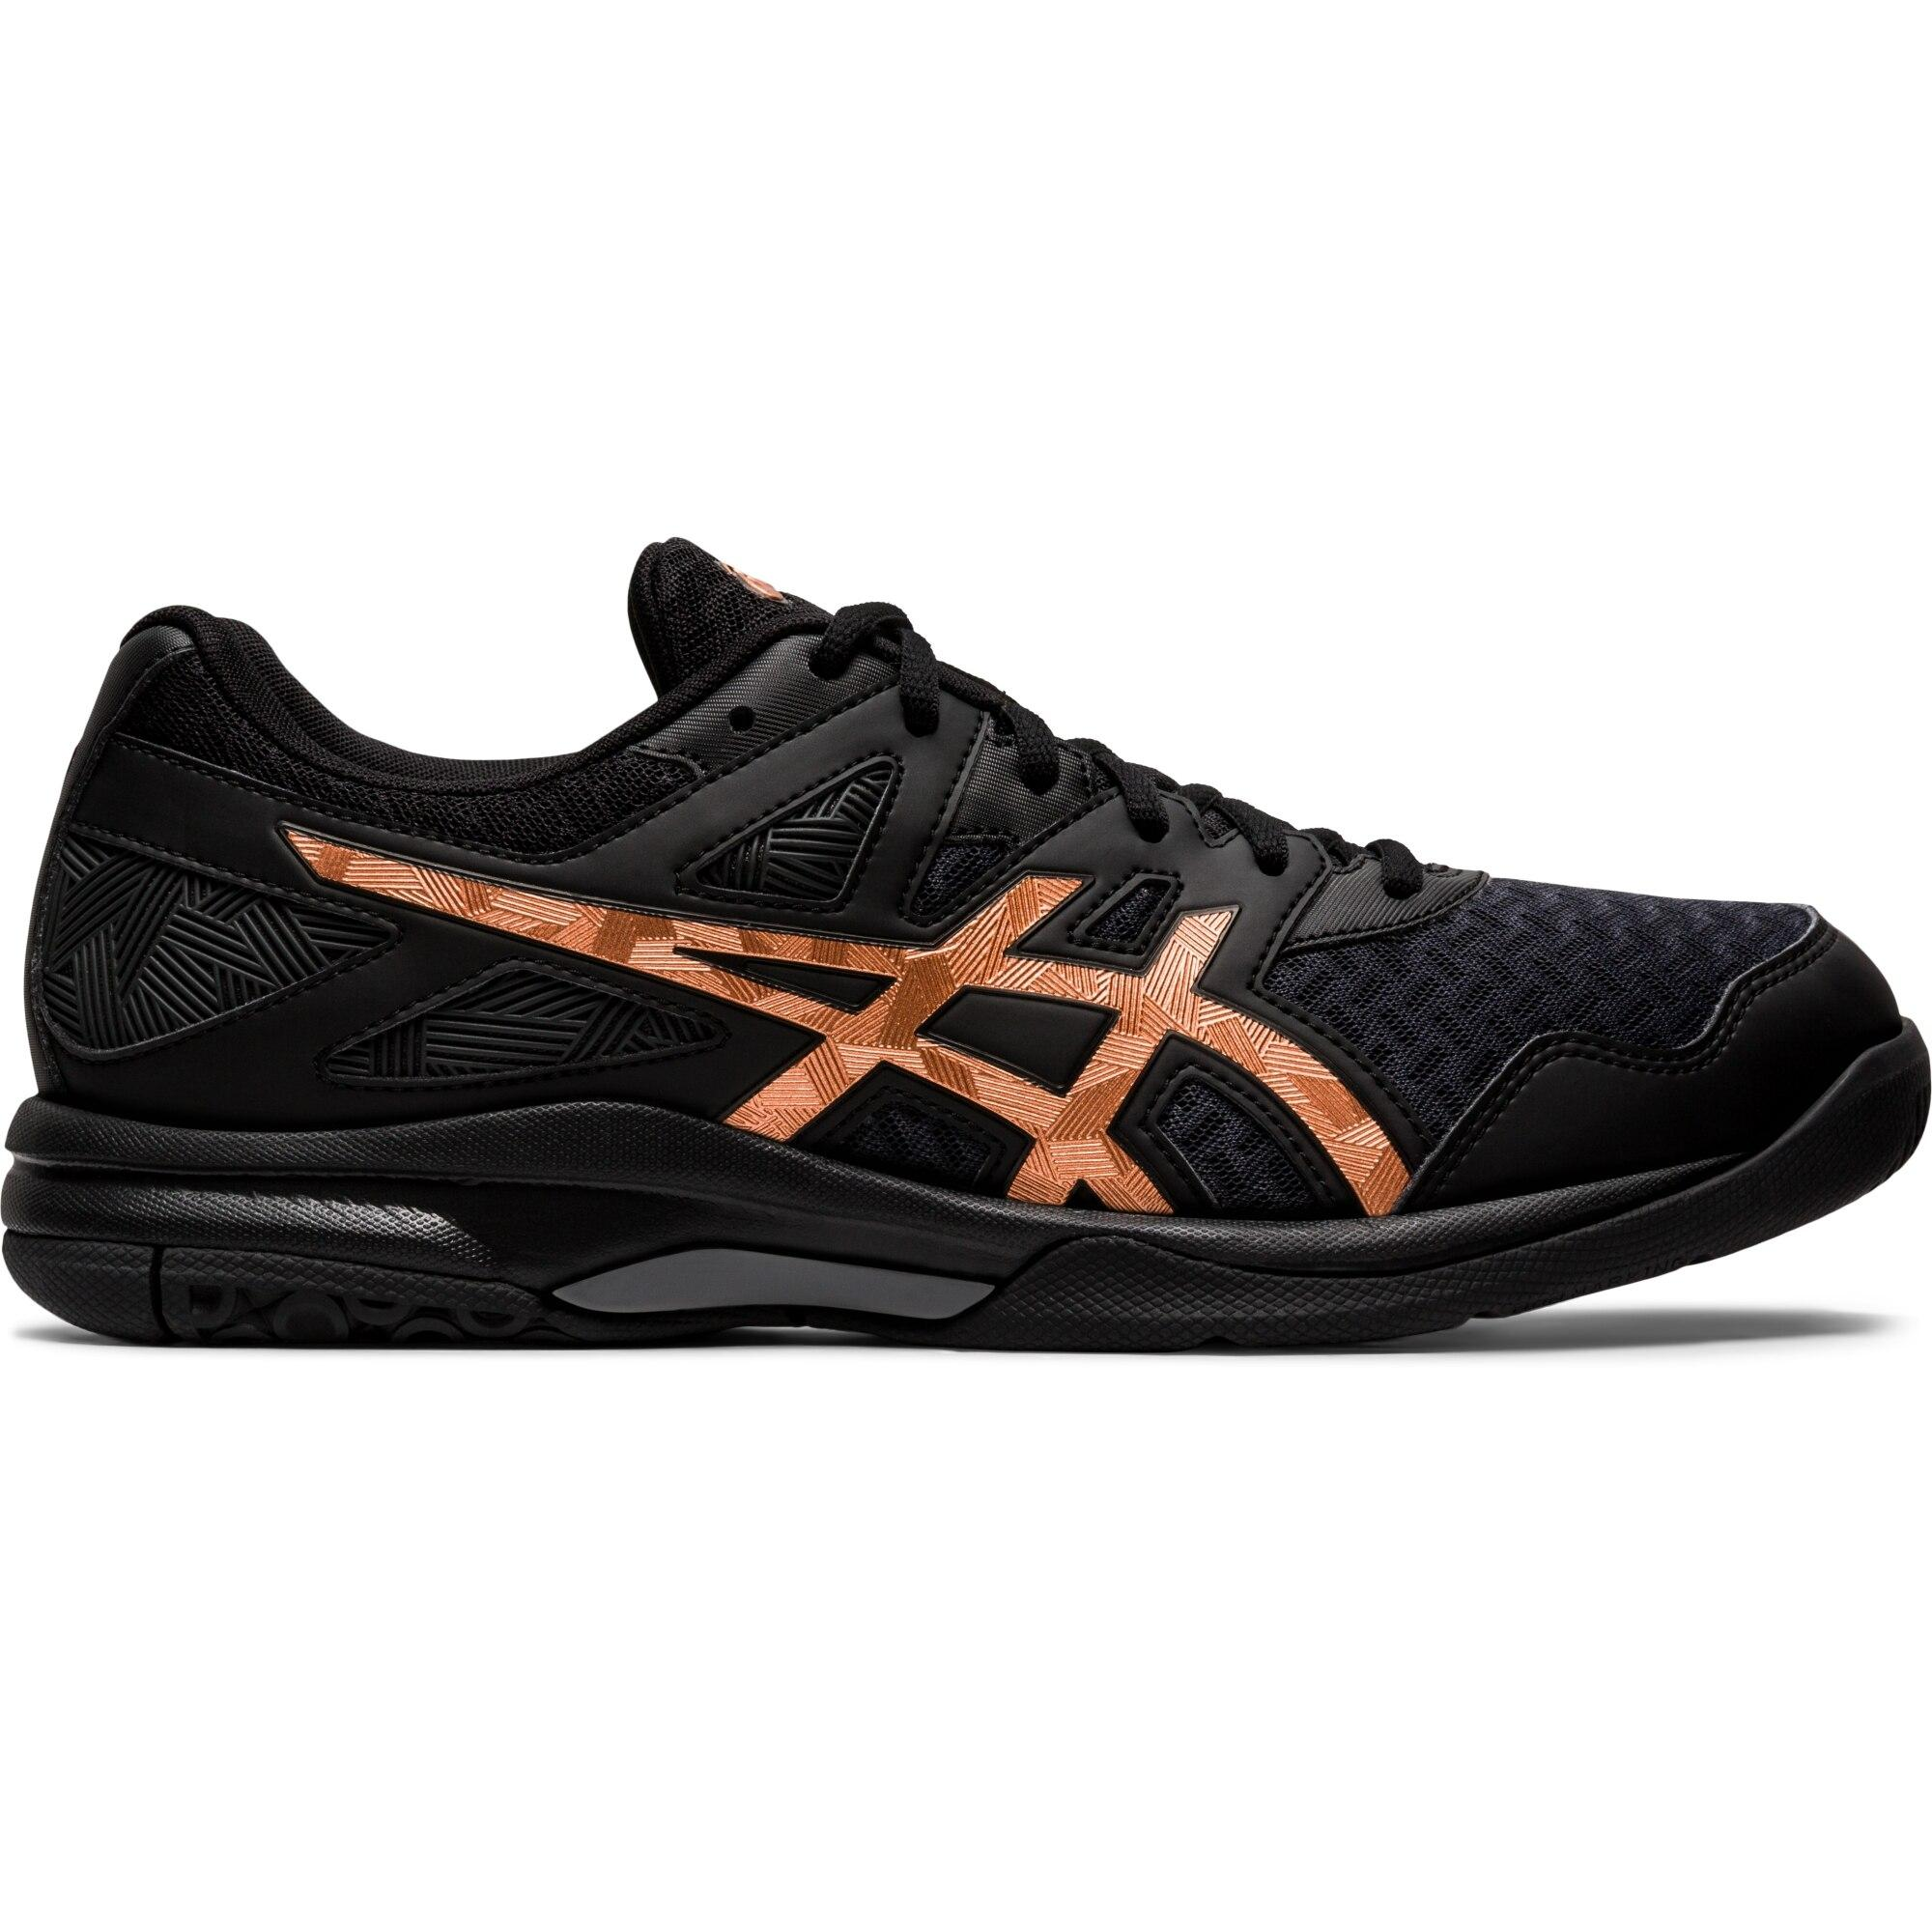 Asics Mens GEL-Task 2 Indoor Court Shoes - Black/Pure Bronze